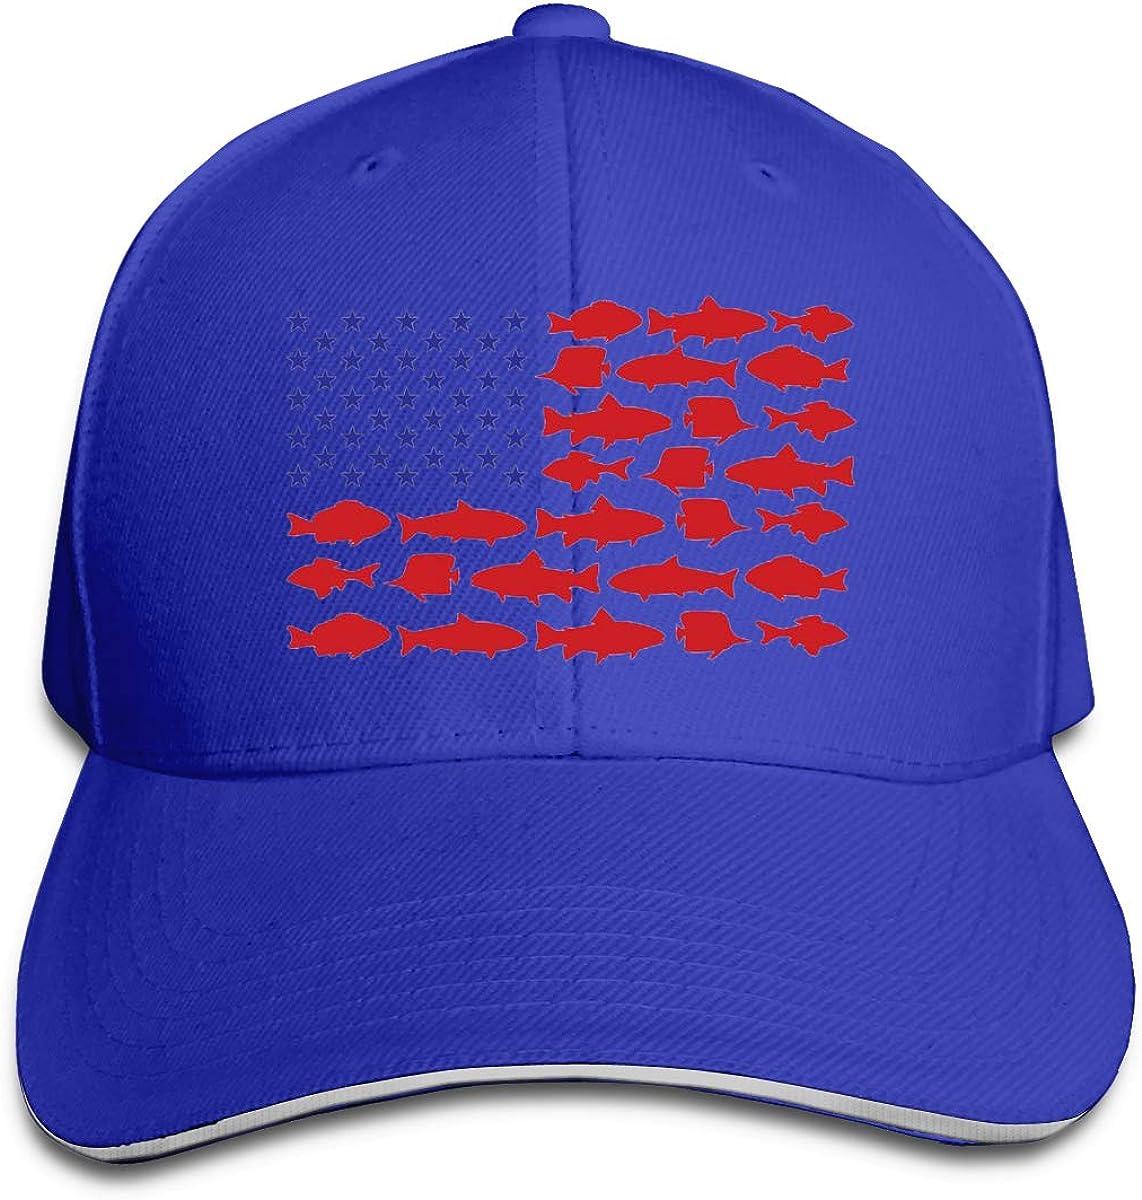 Download Kuailezai Fishing Usa Flag Svg Fishing Men Casquette Cap Denim Cotton Adjustable Hat Custom Funny Fishing Visor Ash Blue Amazon Co Uk Clothing